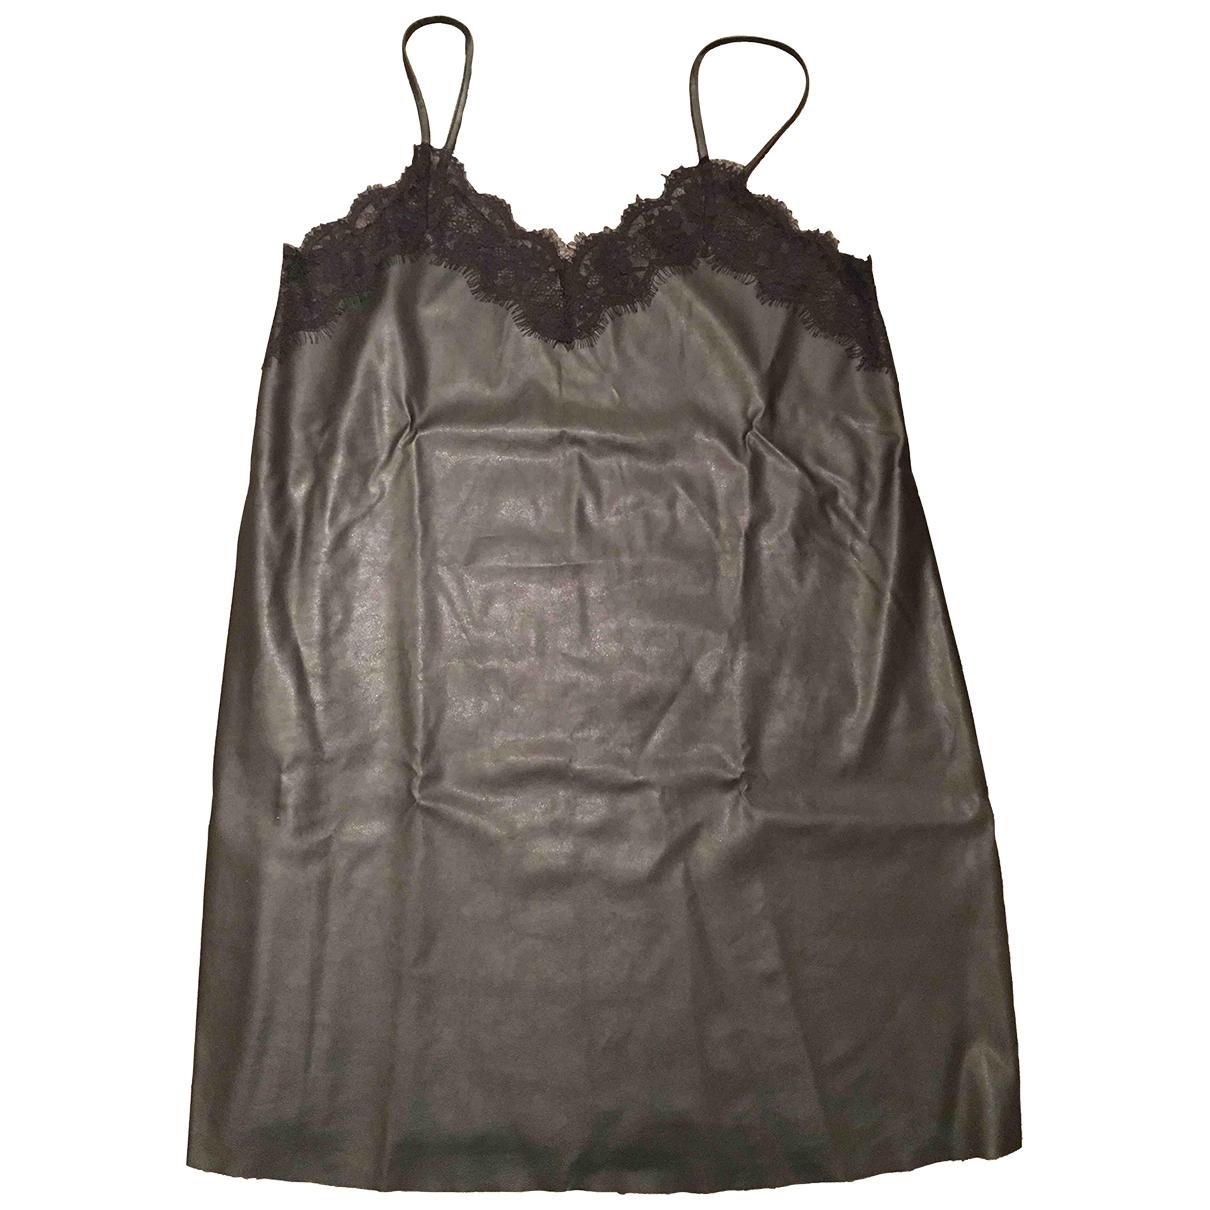 Zara \N Black Leather dress for Women L International